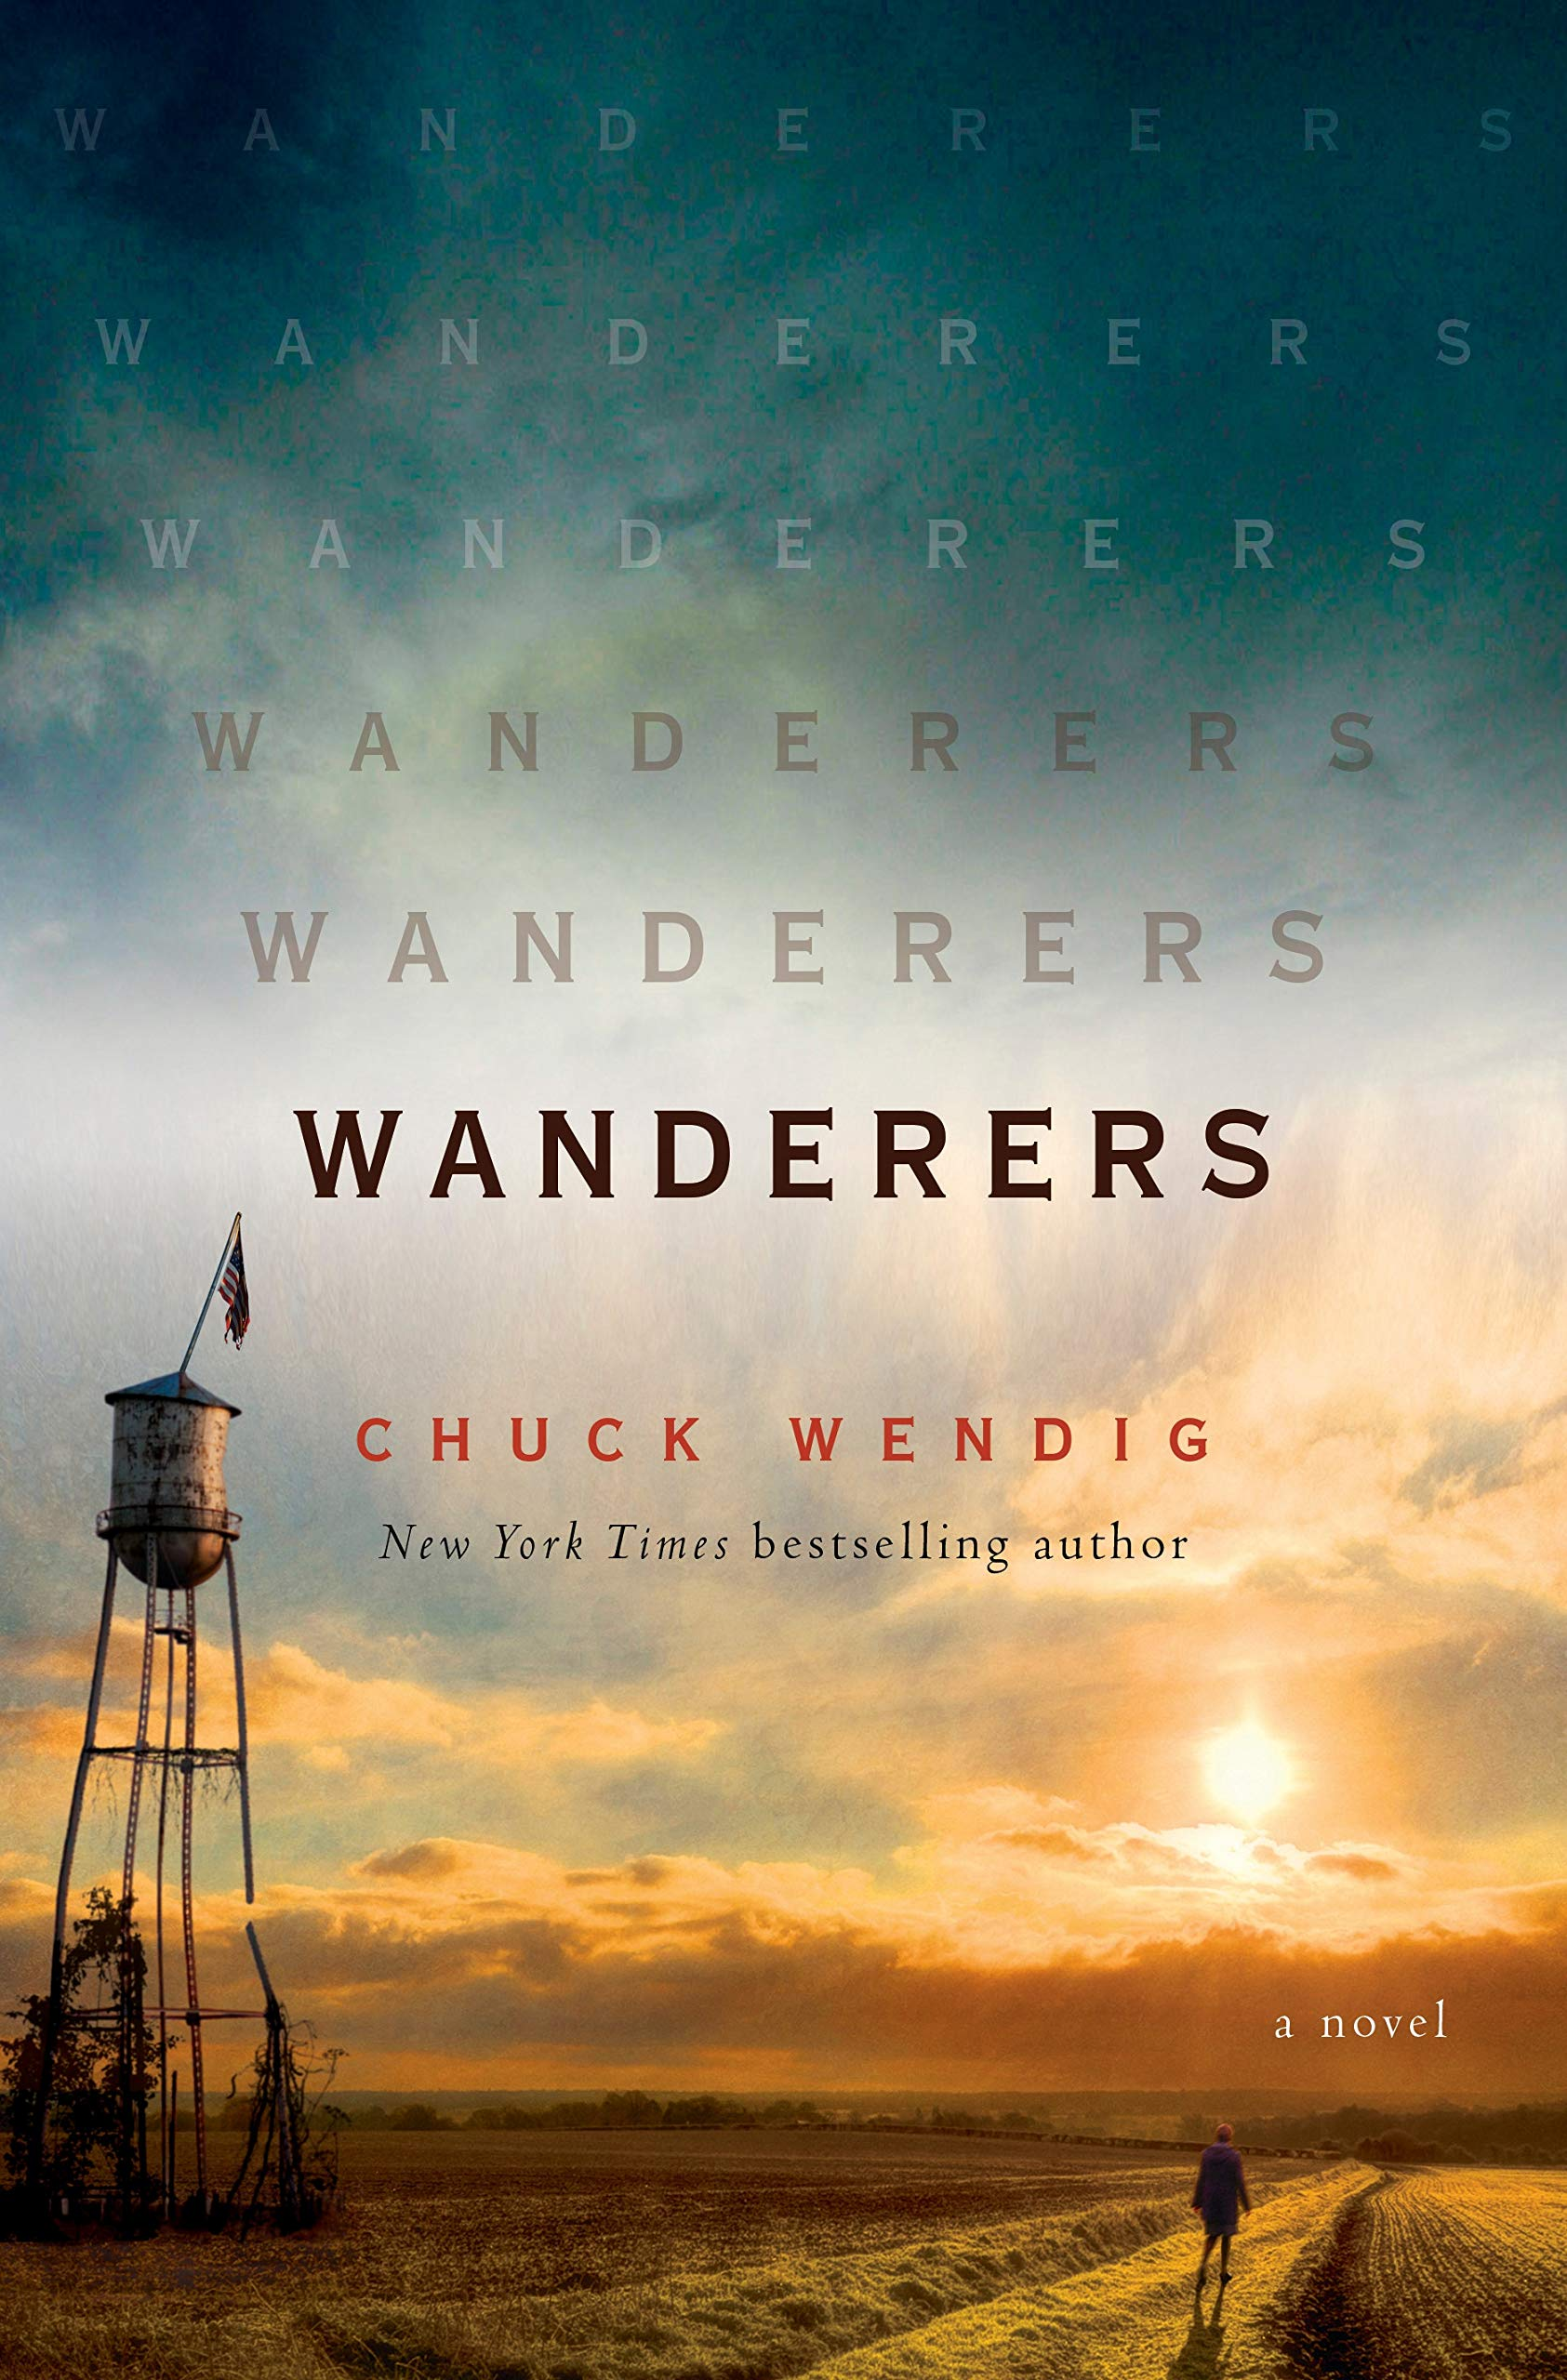 Wanderers_Chuck Wendig.jpg